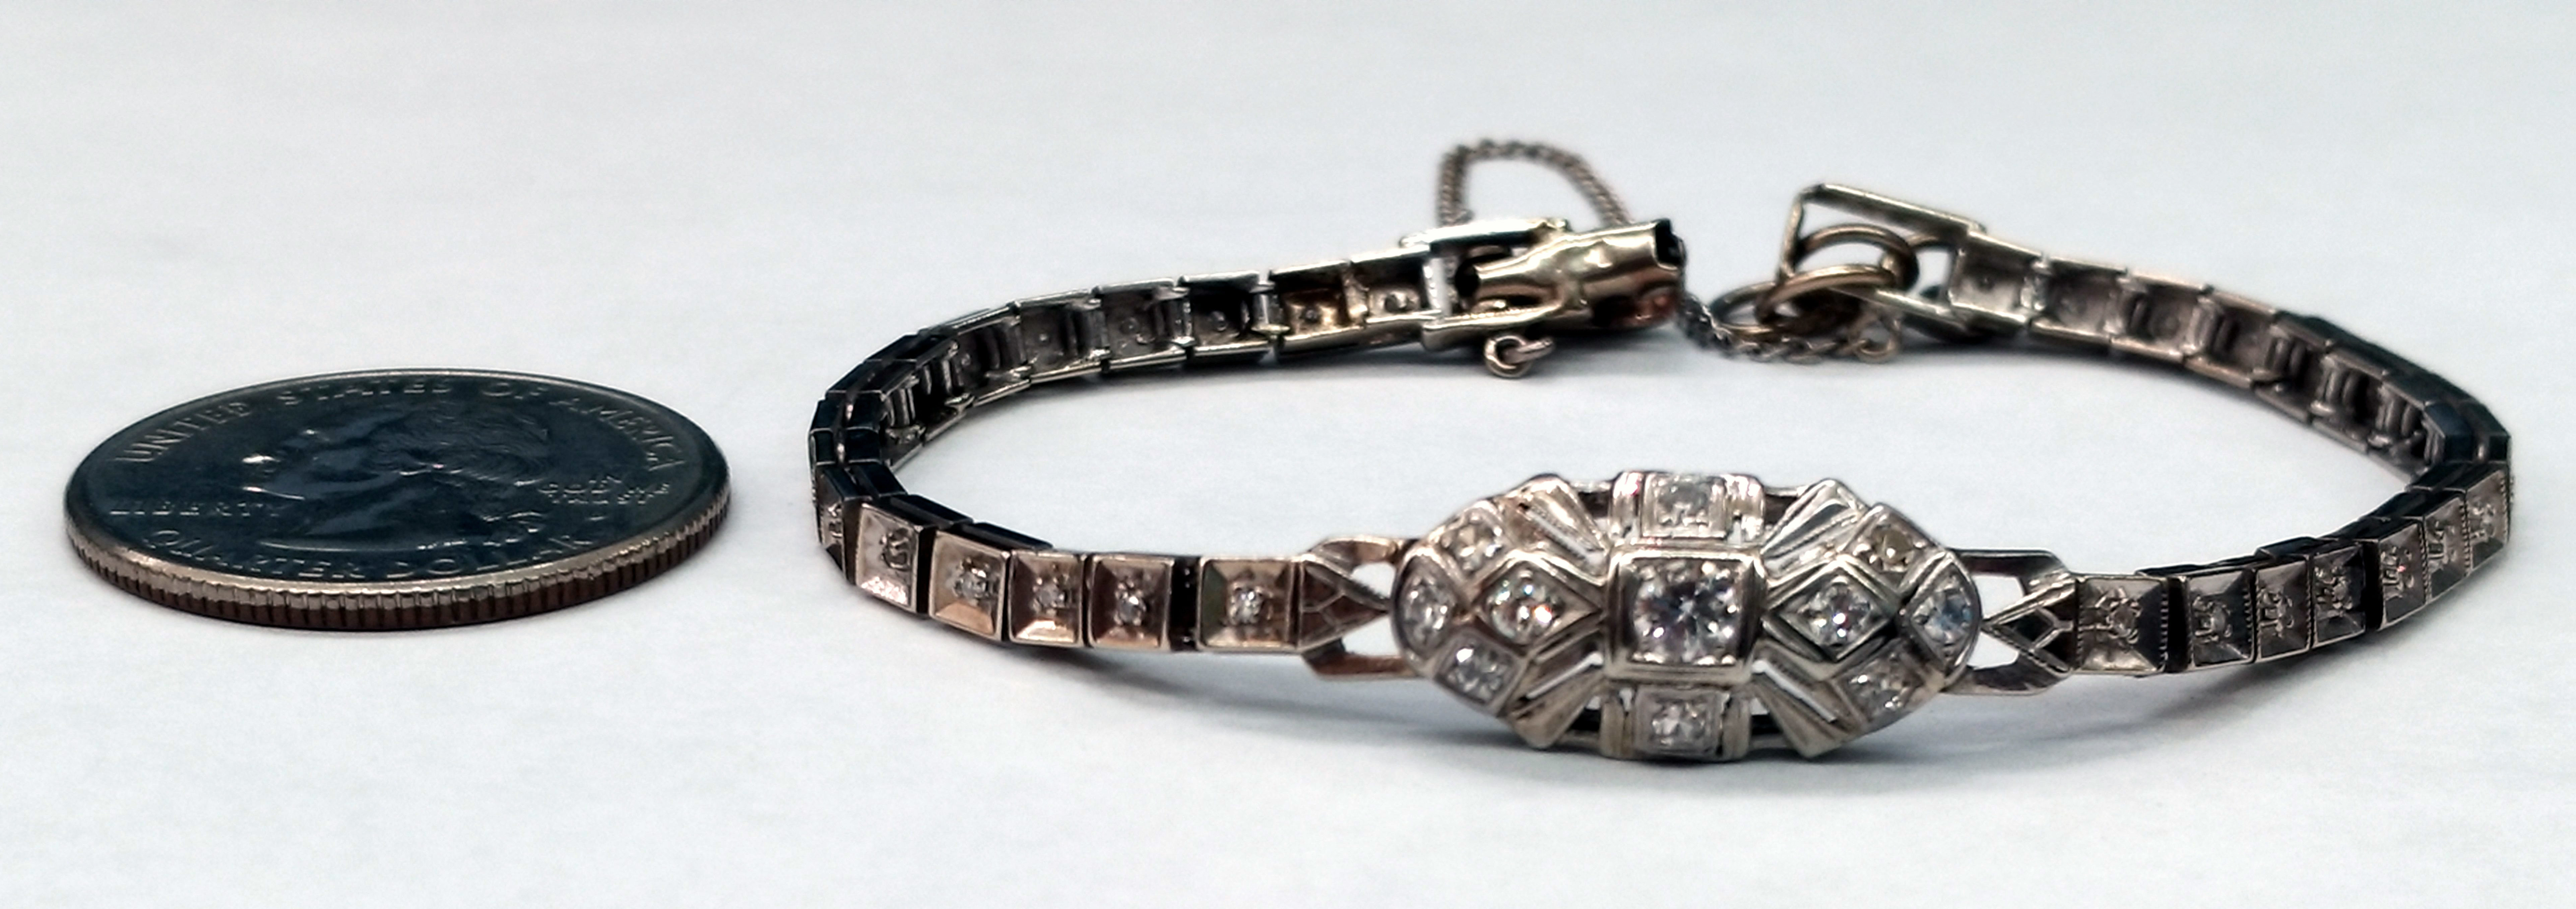 Vintage Diamond 14kt White Gold Bracelet with Safety Chain - 6 1/2